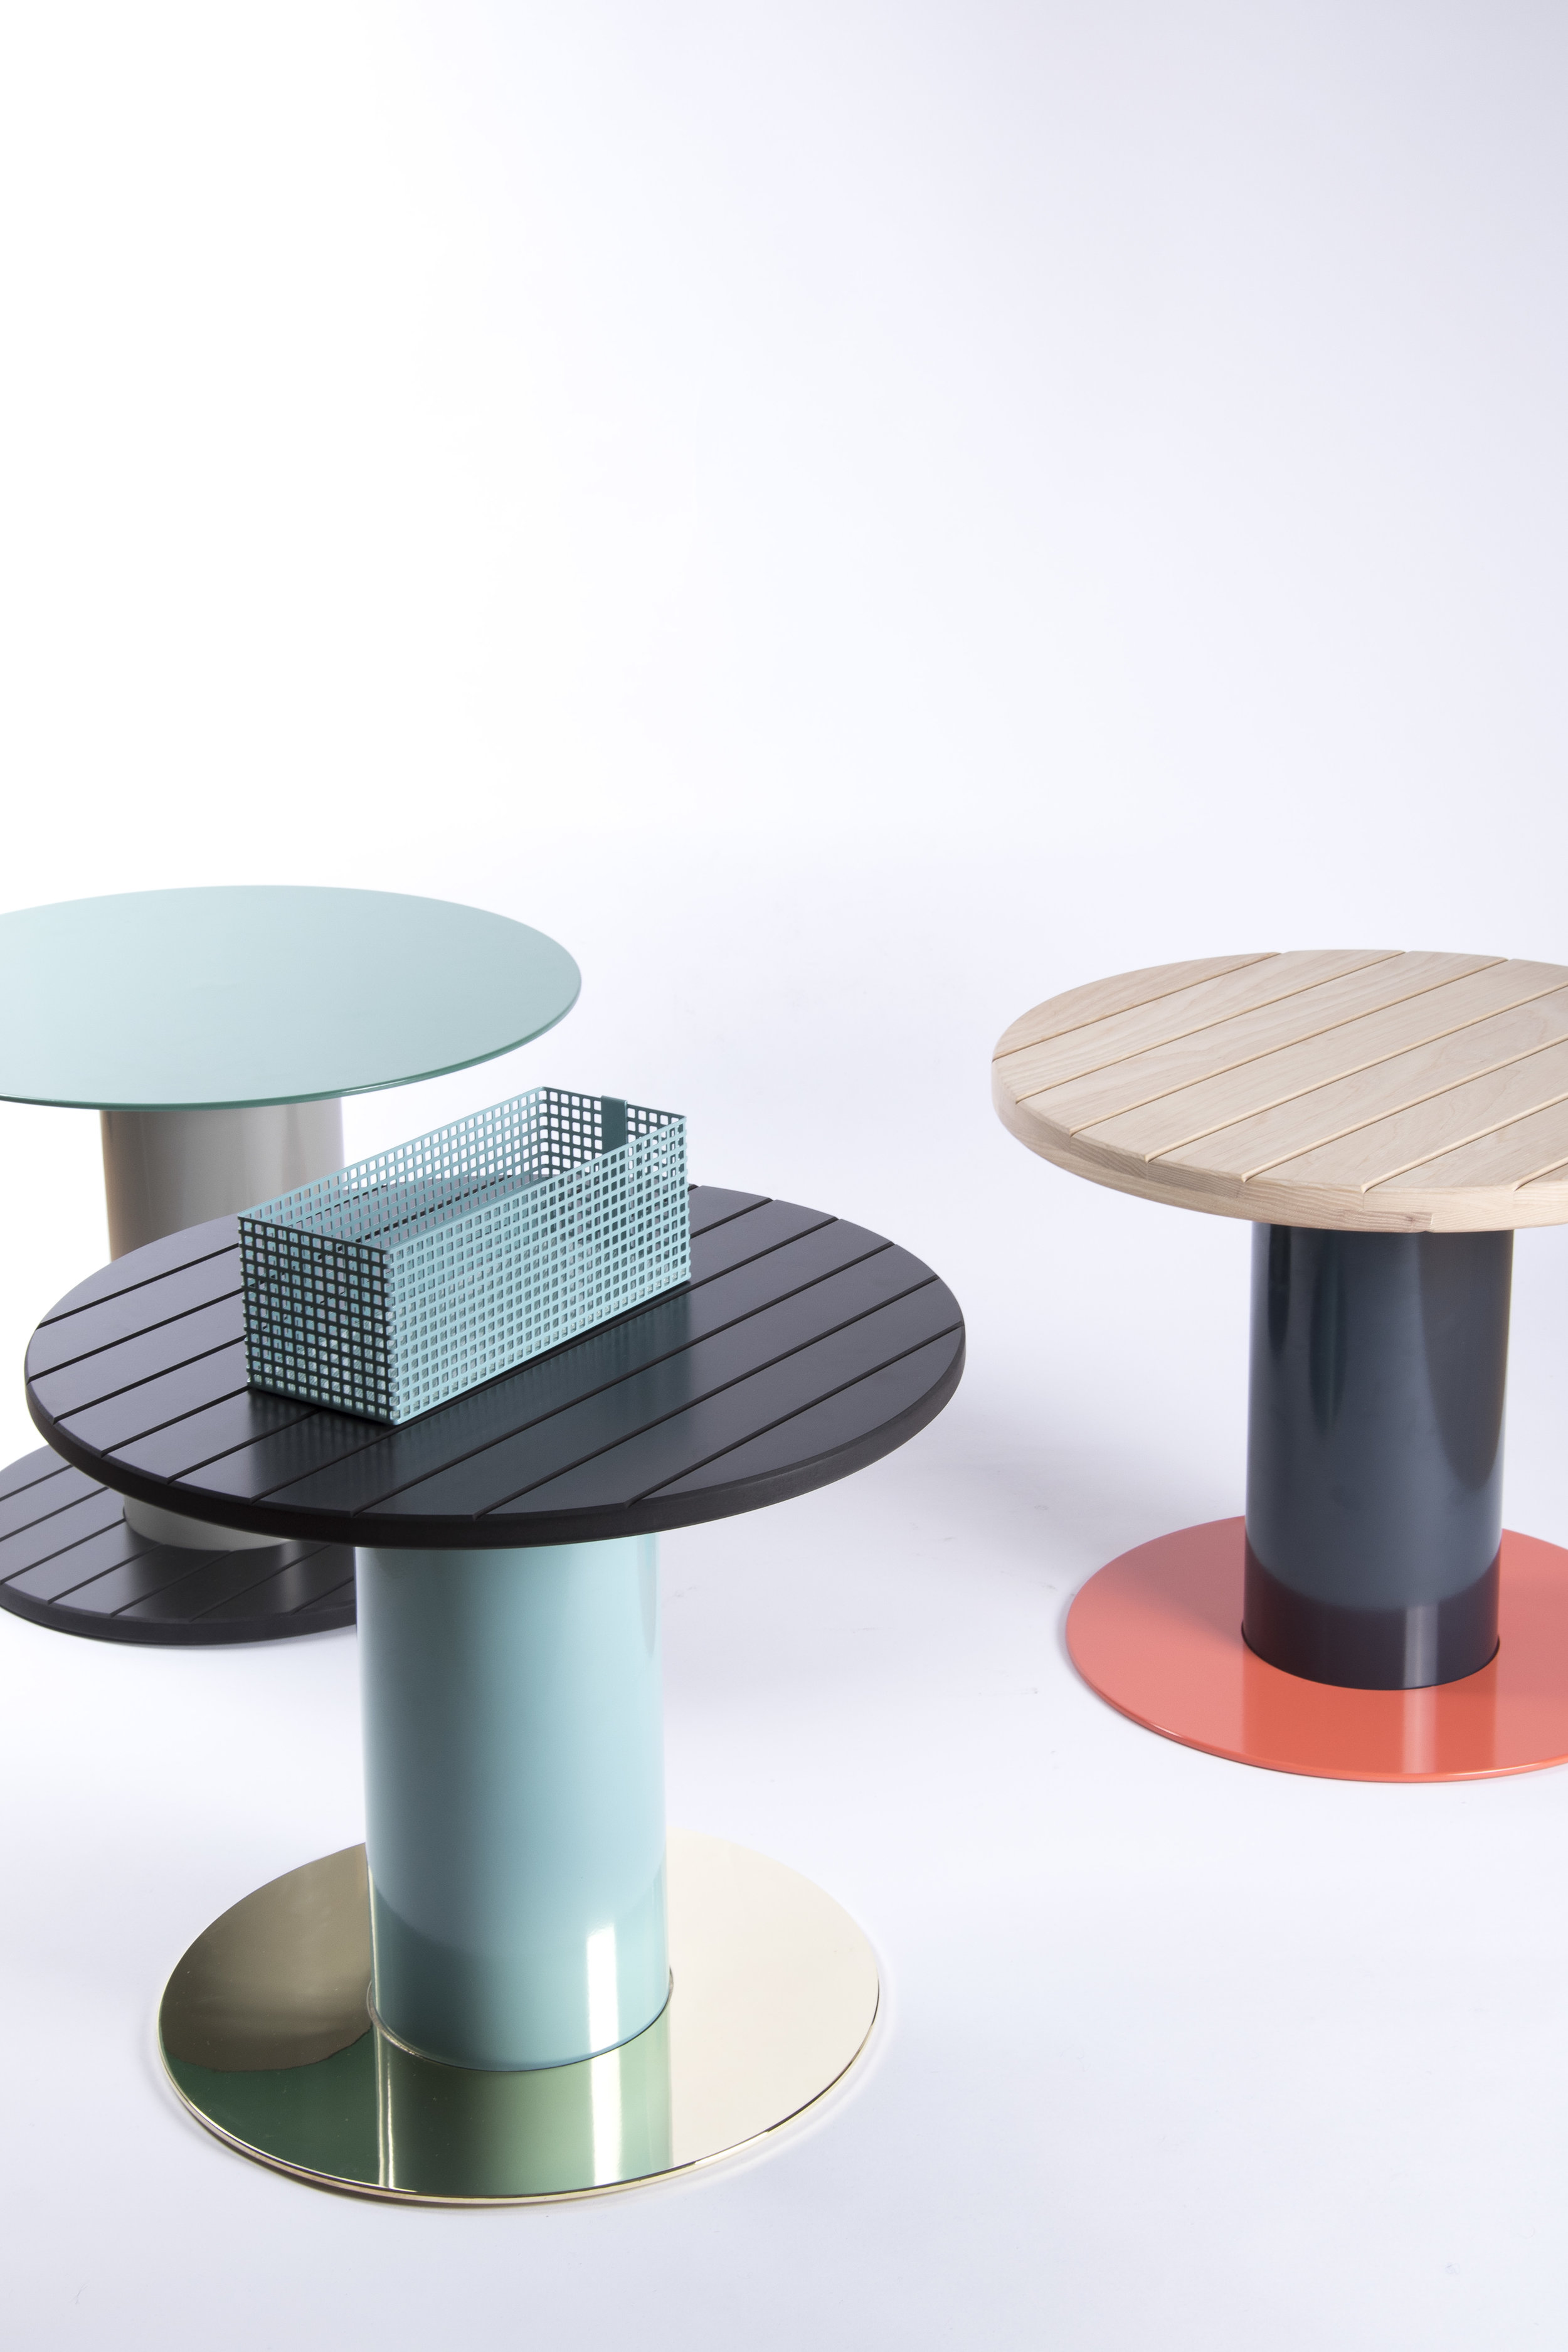 Reel Side Tables - David Derksen Design09.jpg